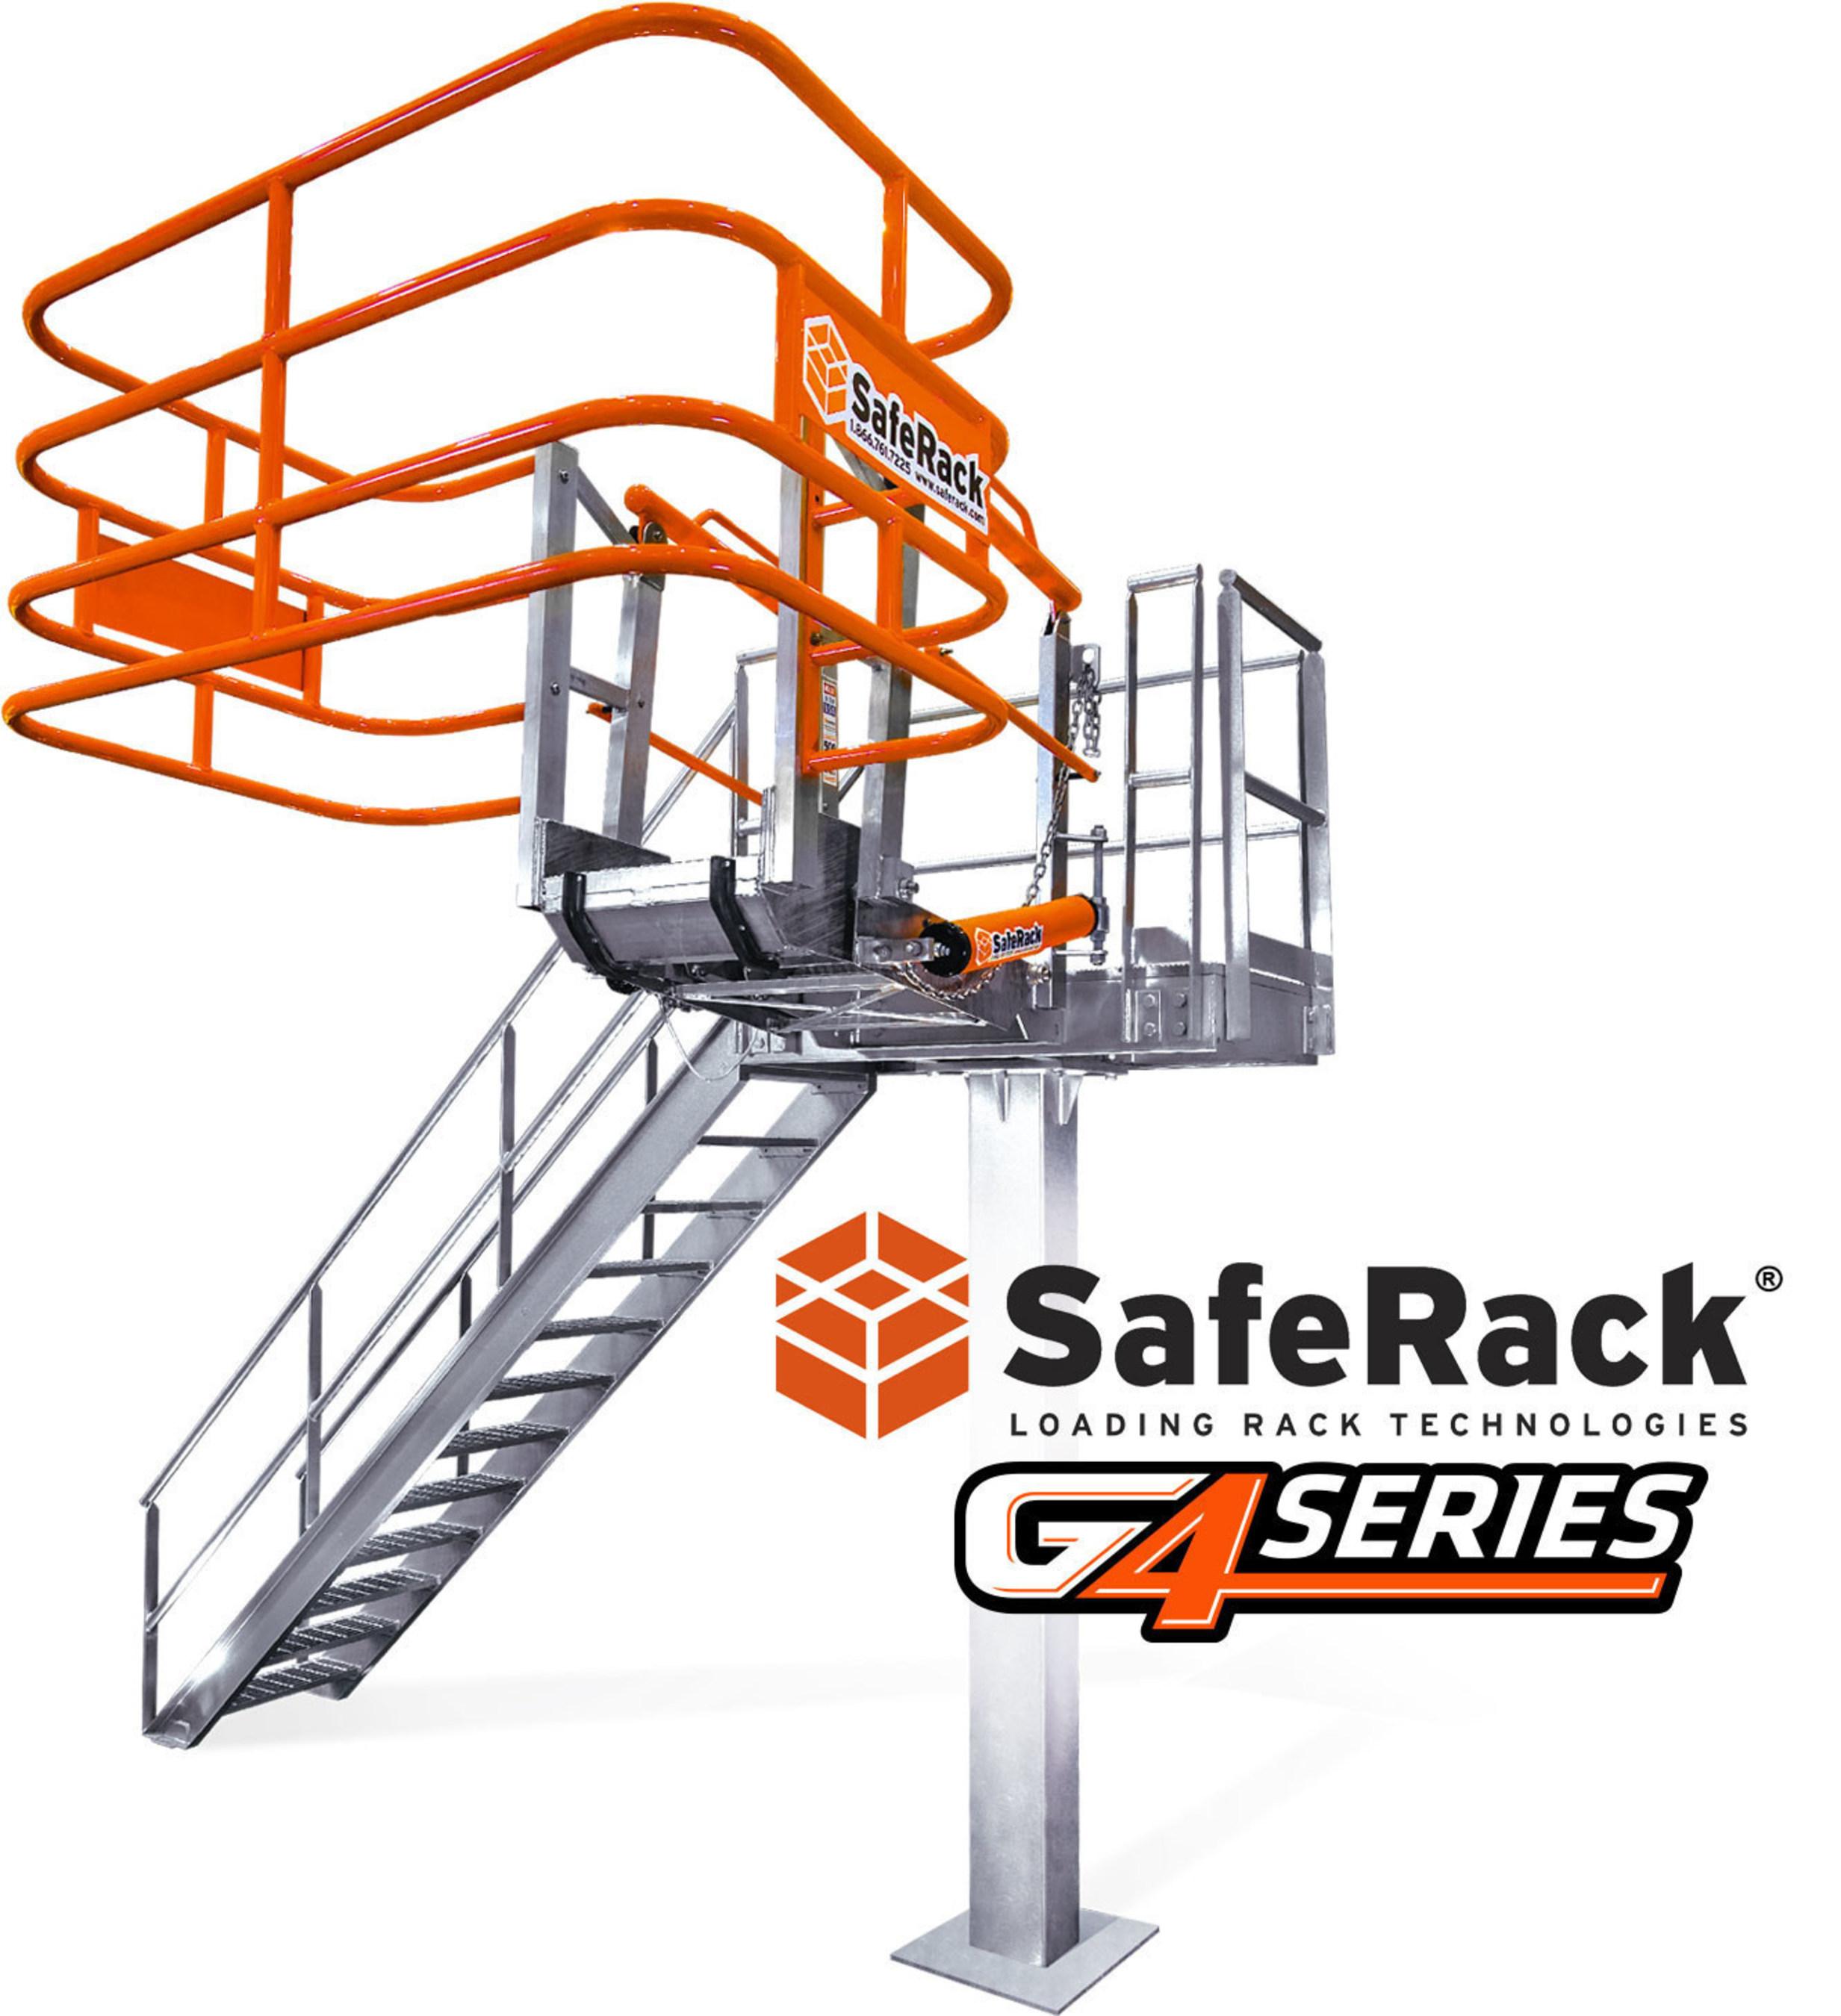 SafeRack